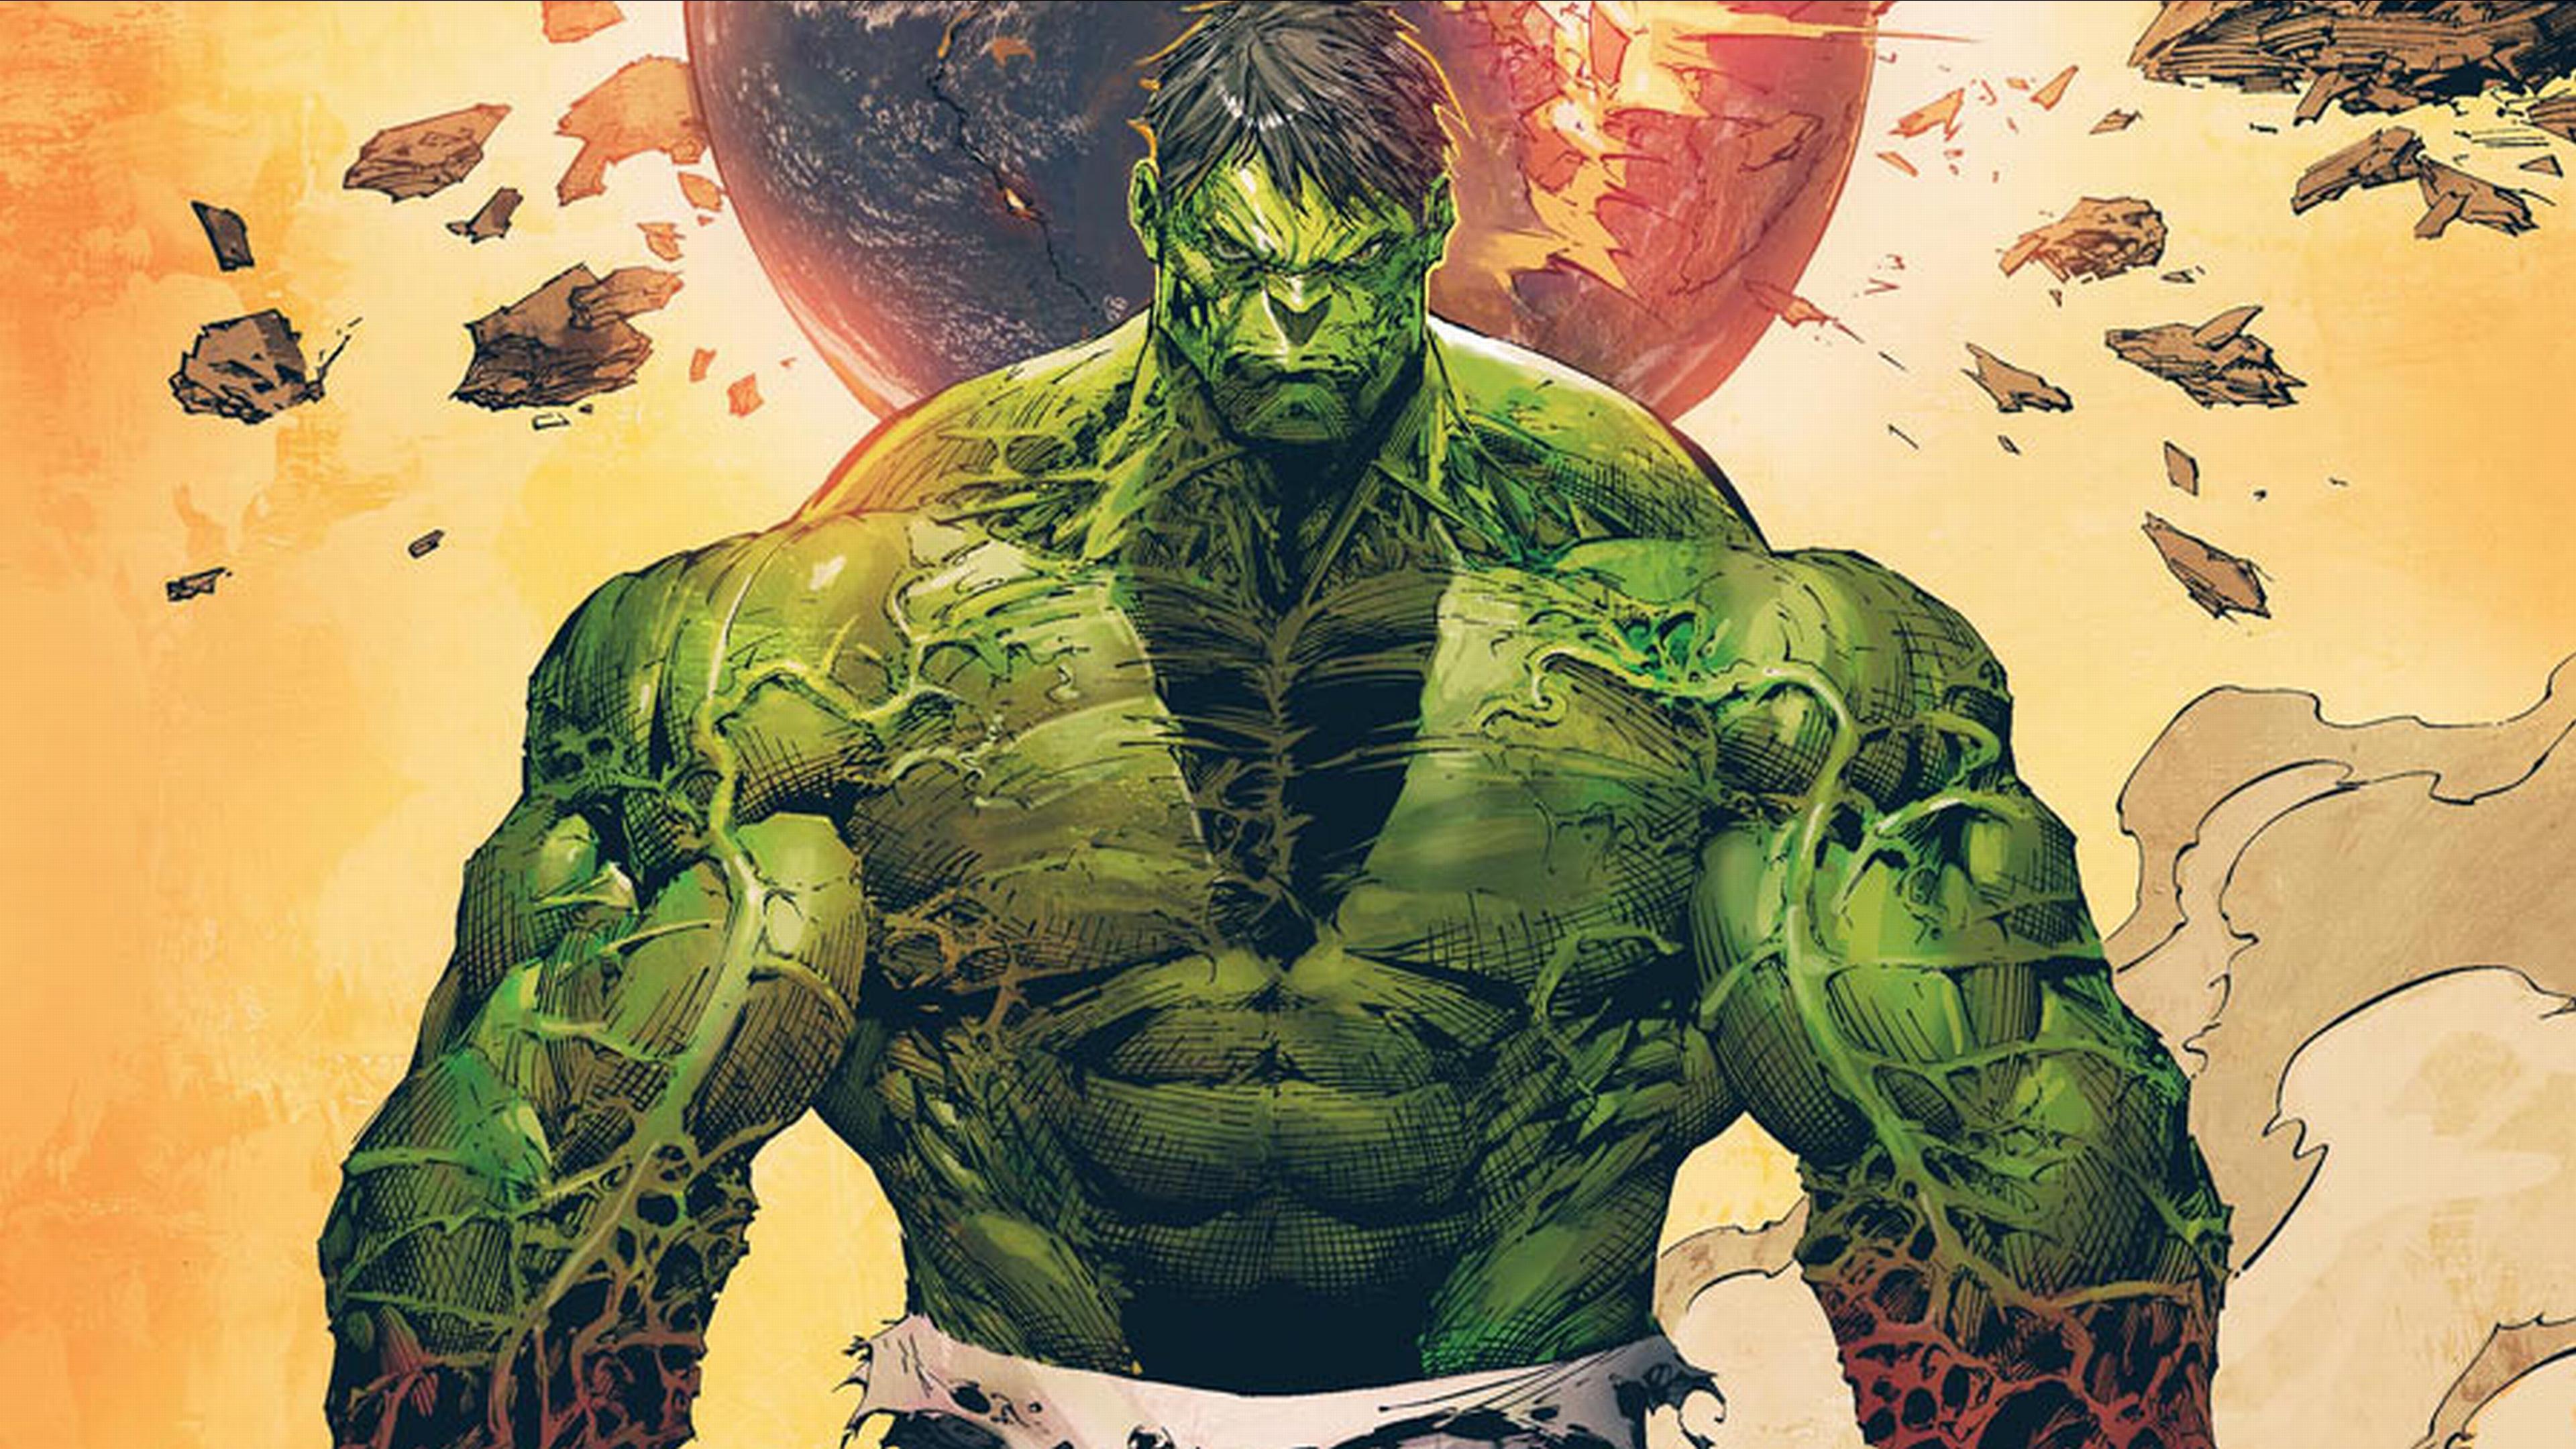 hulk 4k ultra hd wallpaper and background image